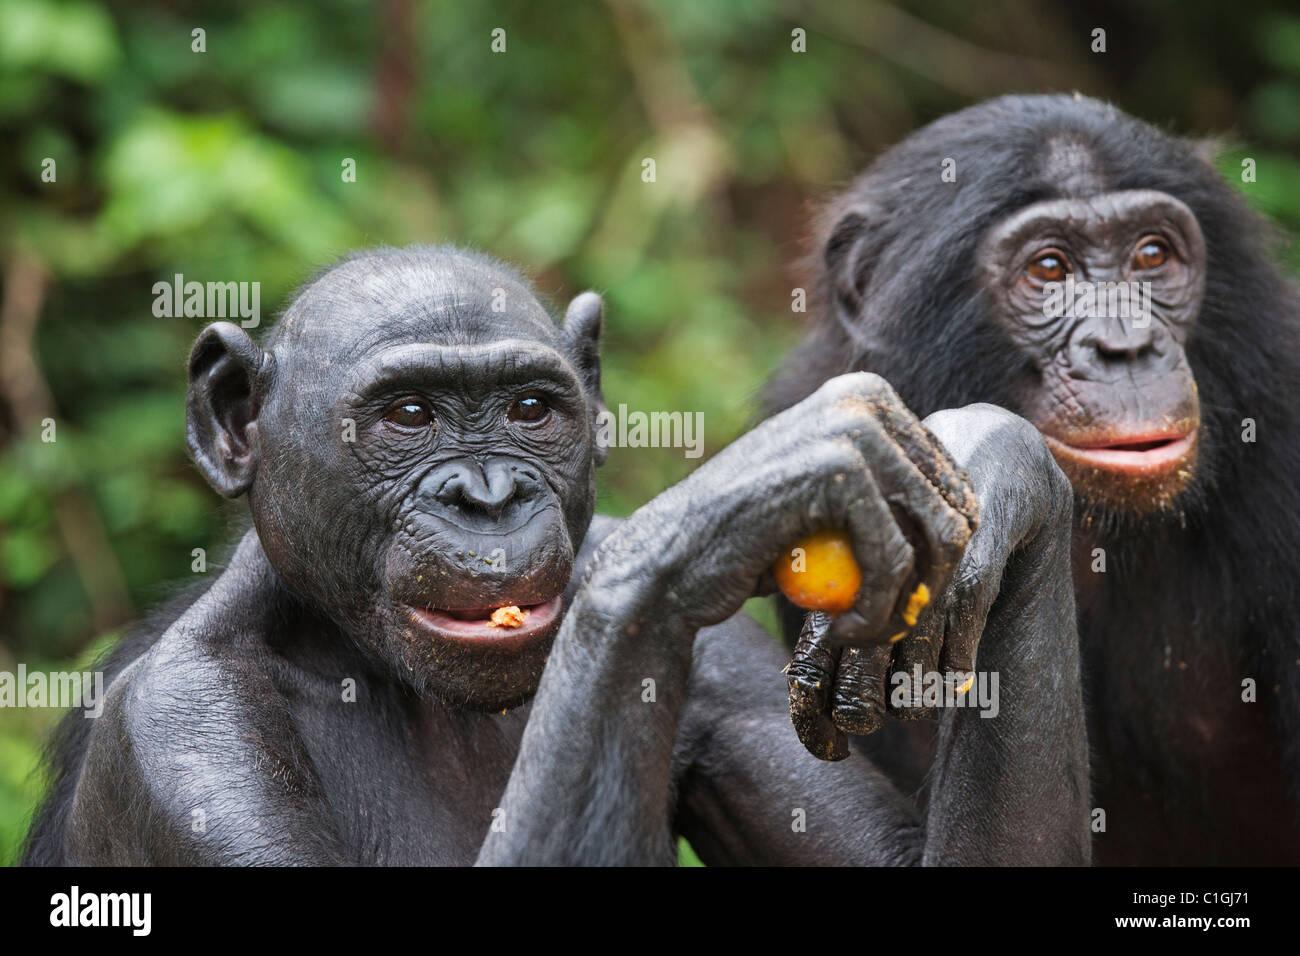 Bonobo Chimpanzee at the Sanctuary Lola Ya Bonobo, Democratic Republic of the Congo - Stock Image